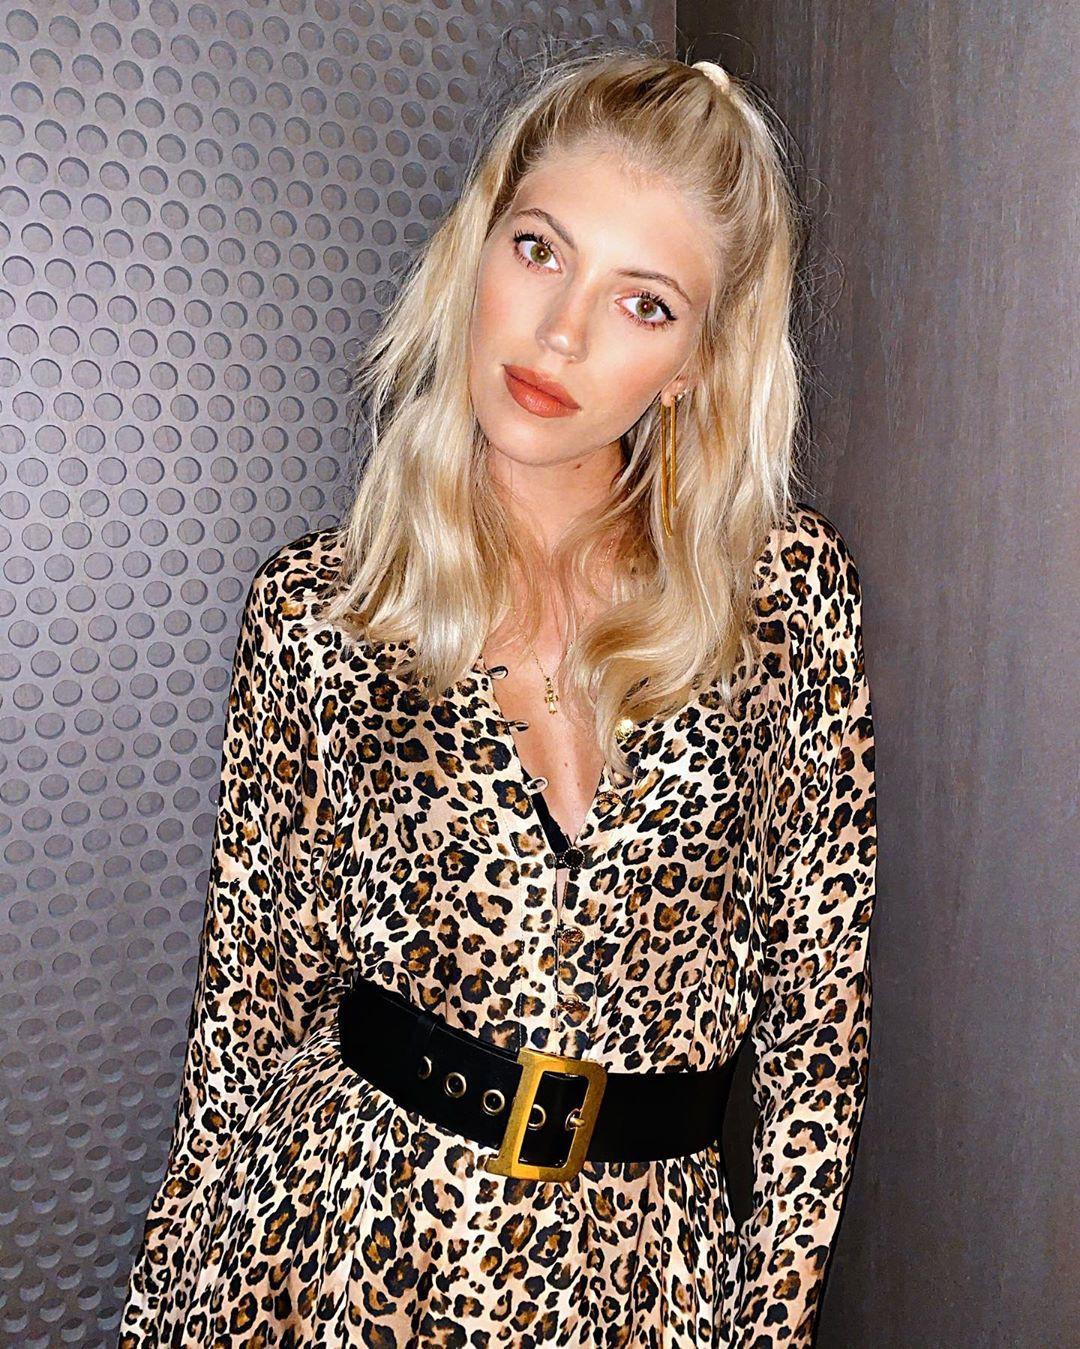 Devon Windsor dress colour combination, cute blond hairs, Perfect Lips